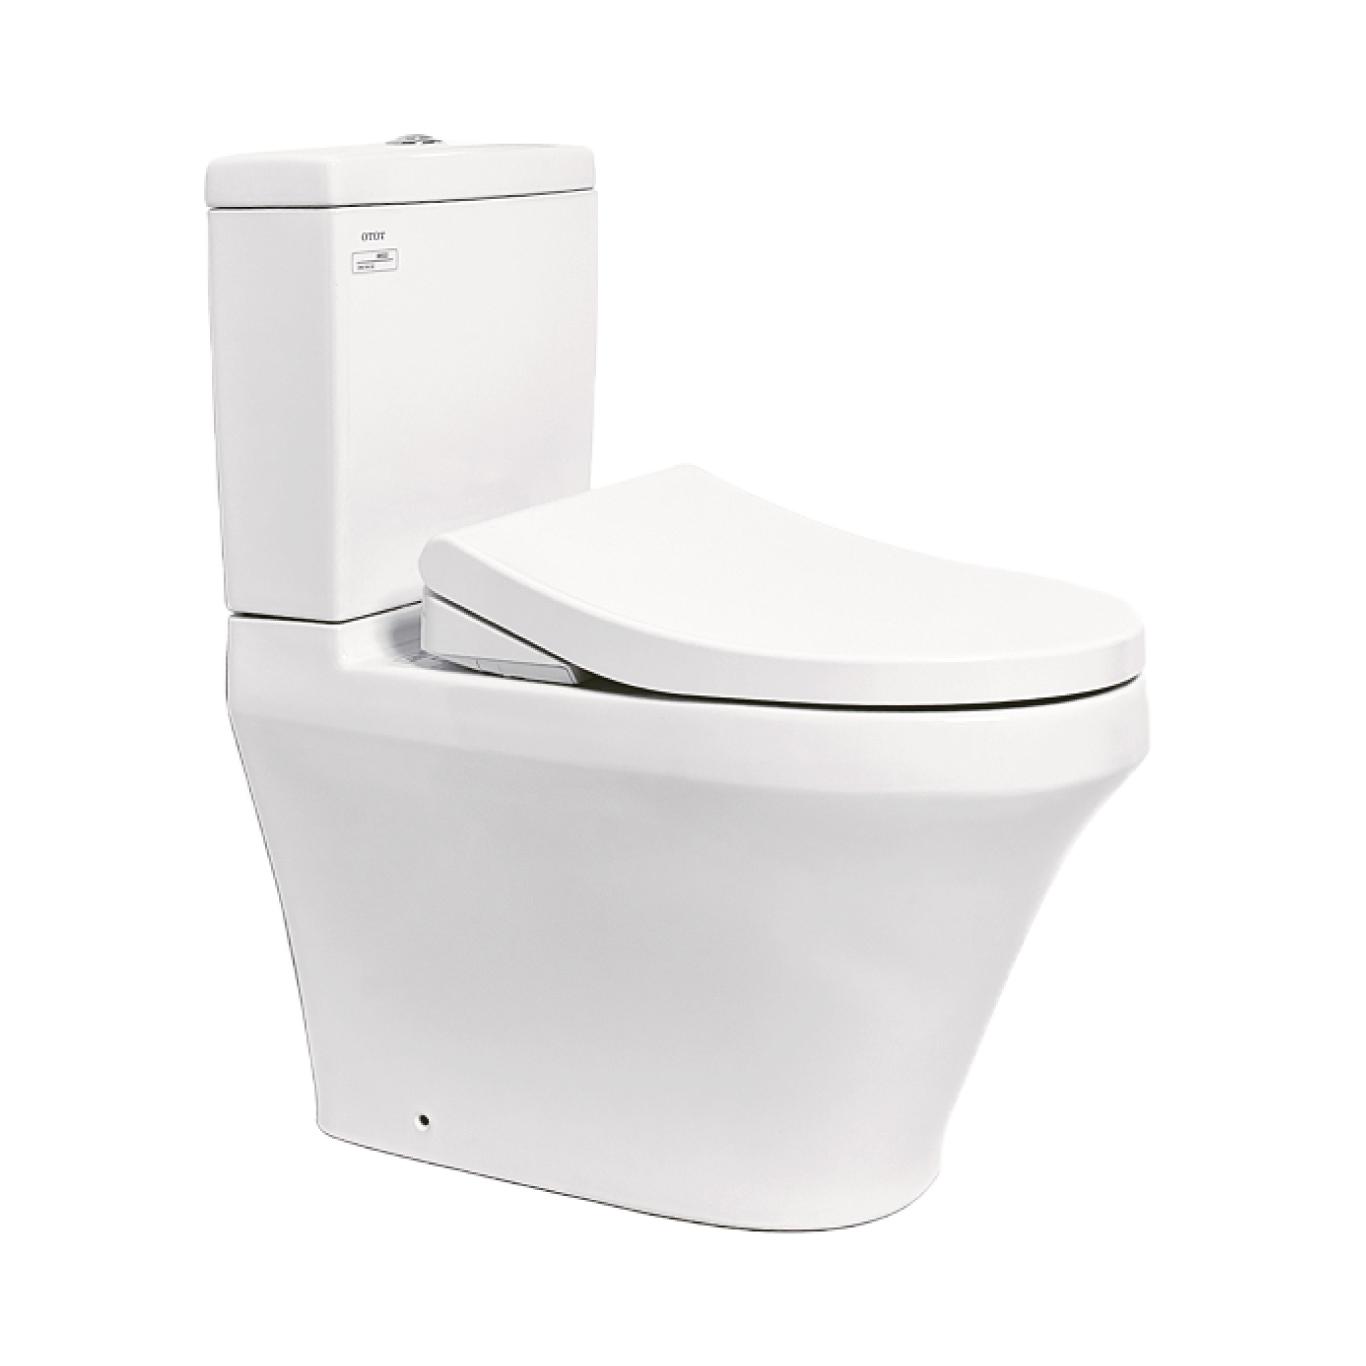 Toilet TOTO model CS945DNE4